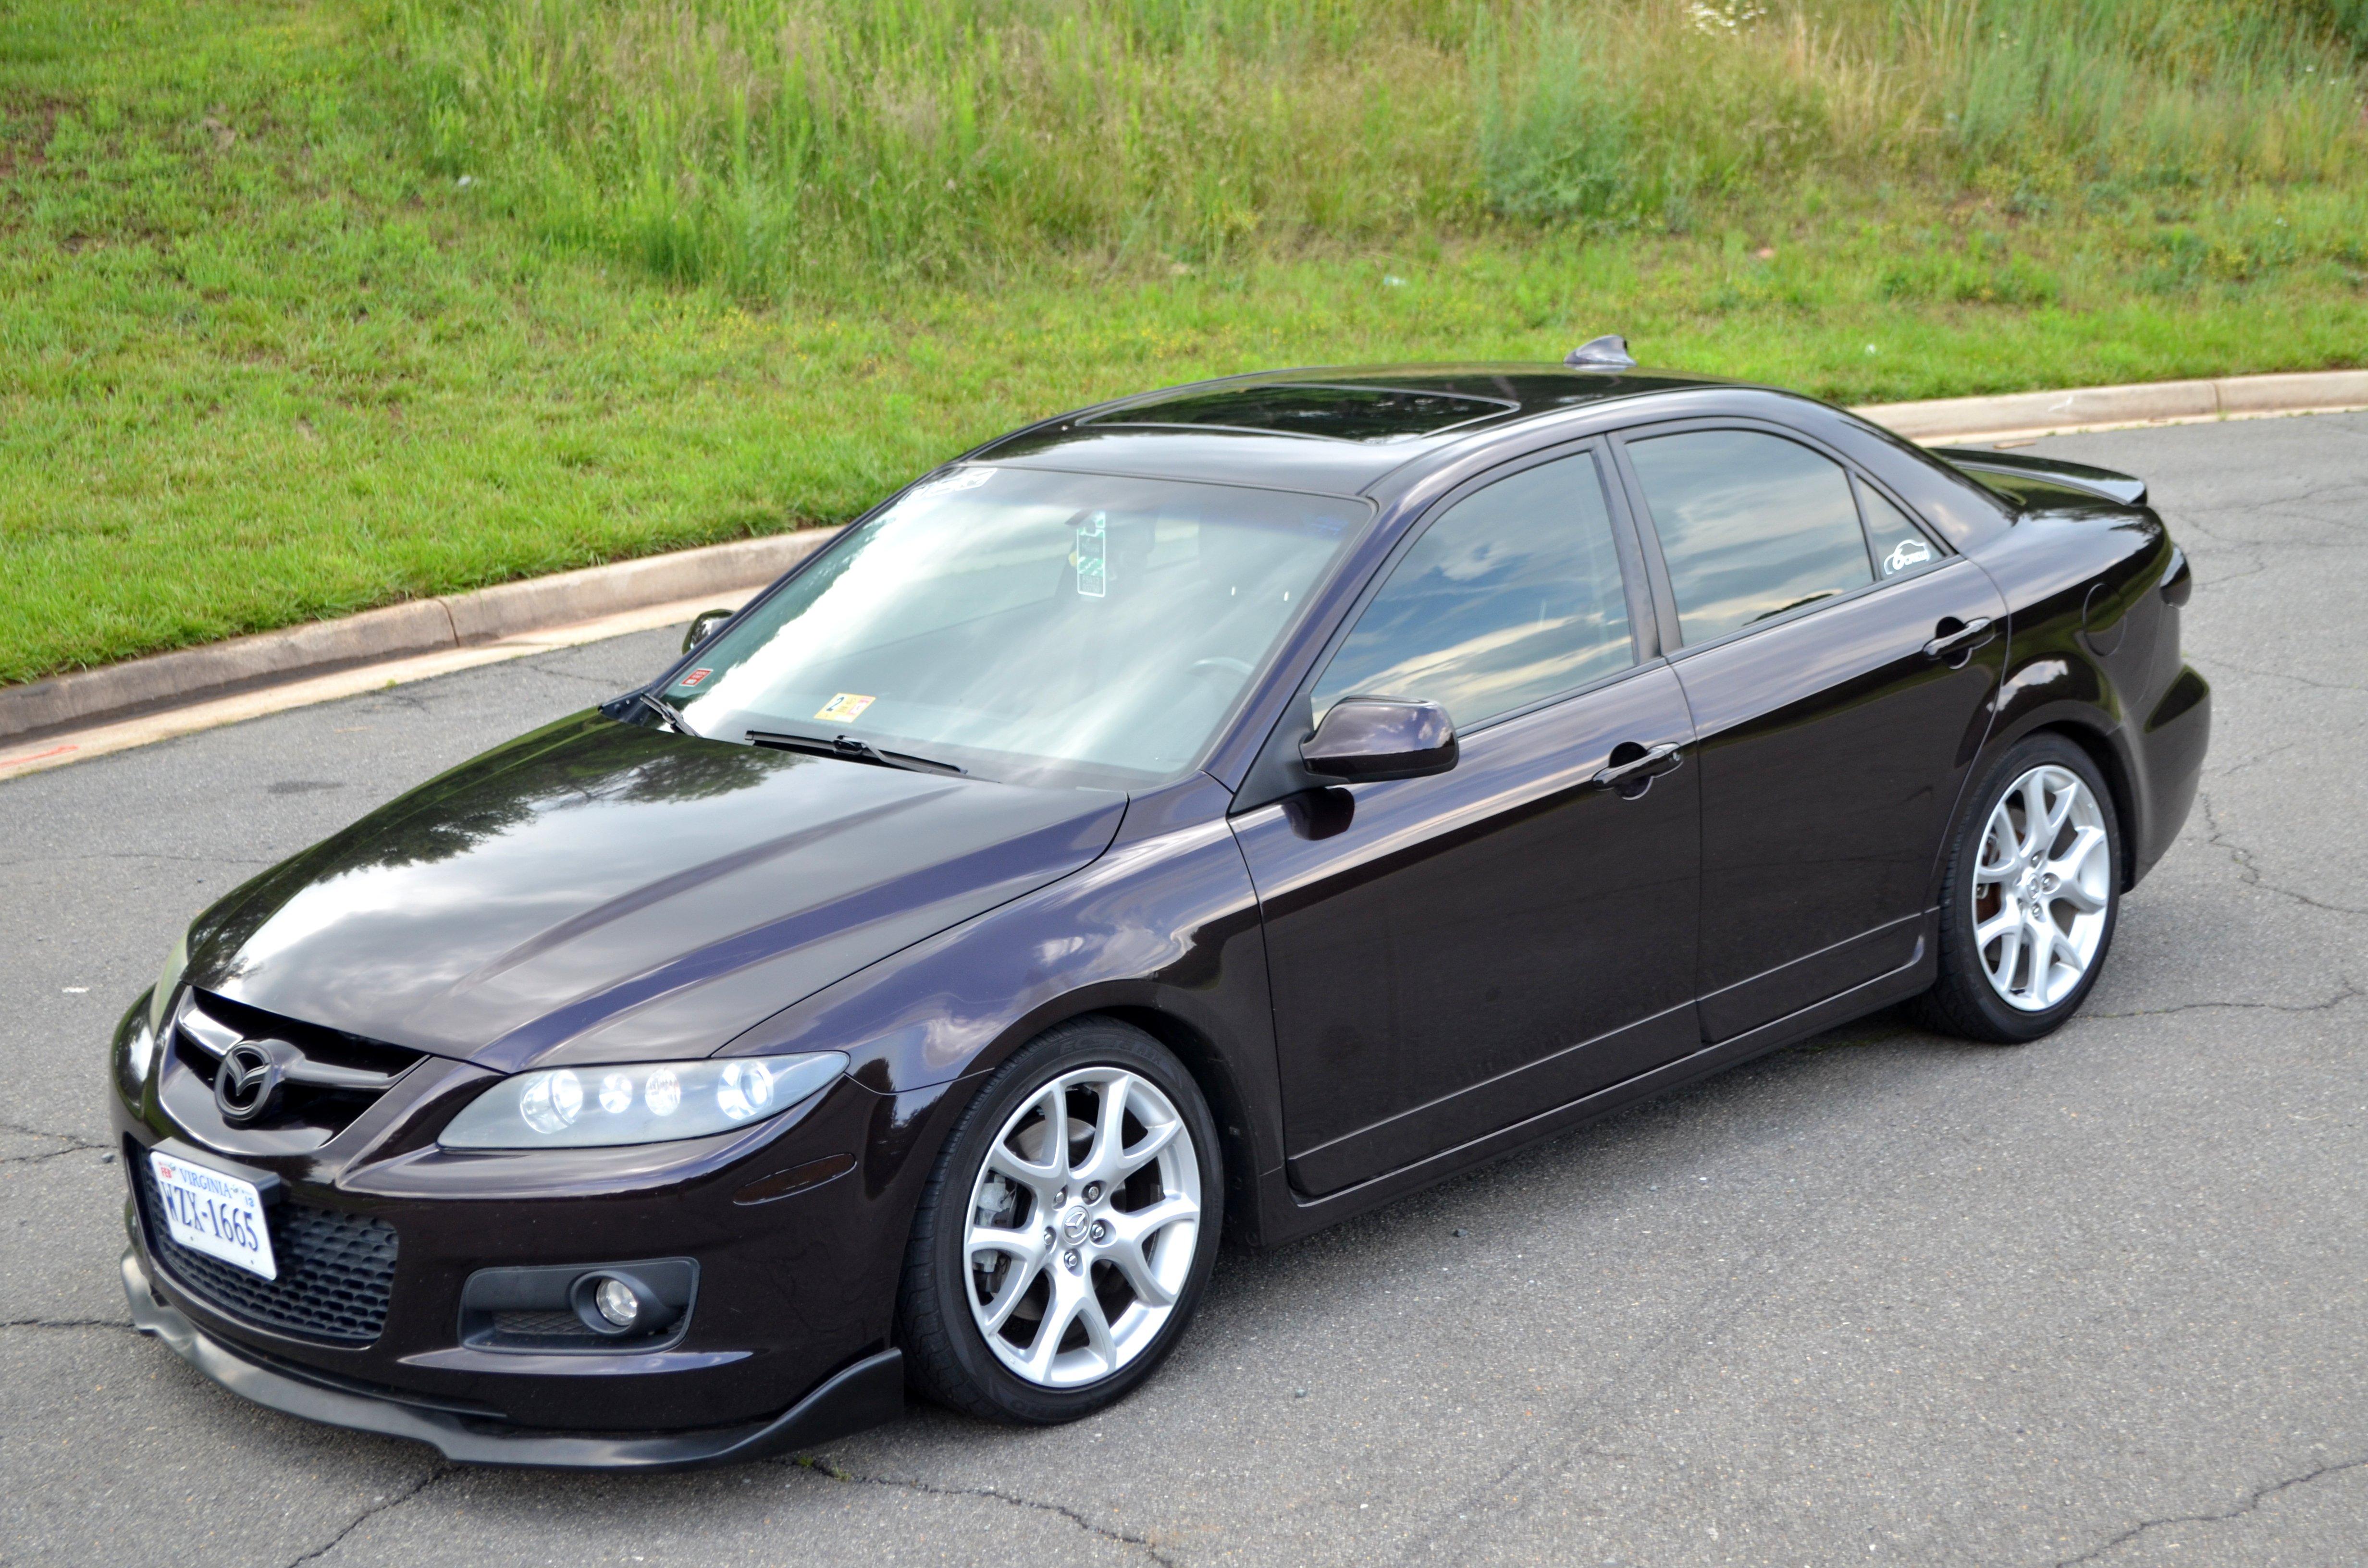 VWVortex.com - Mazdaspeed 6?